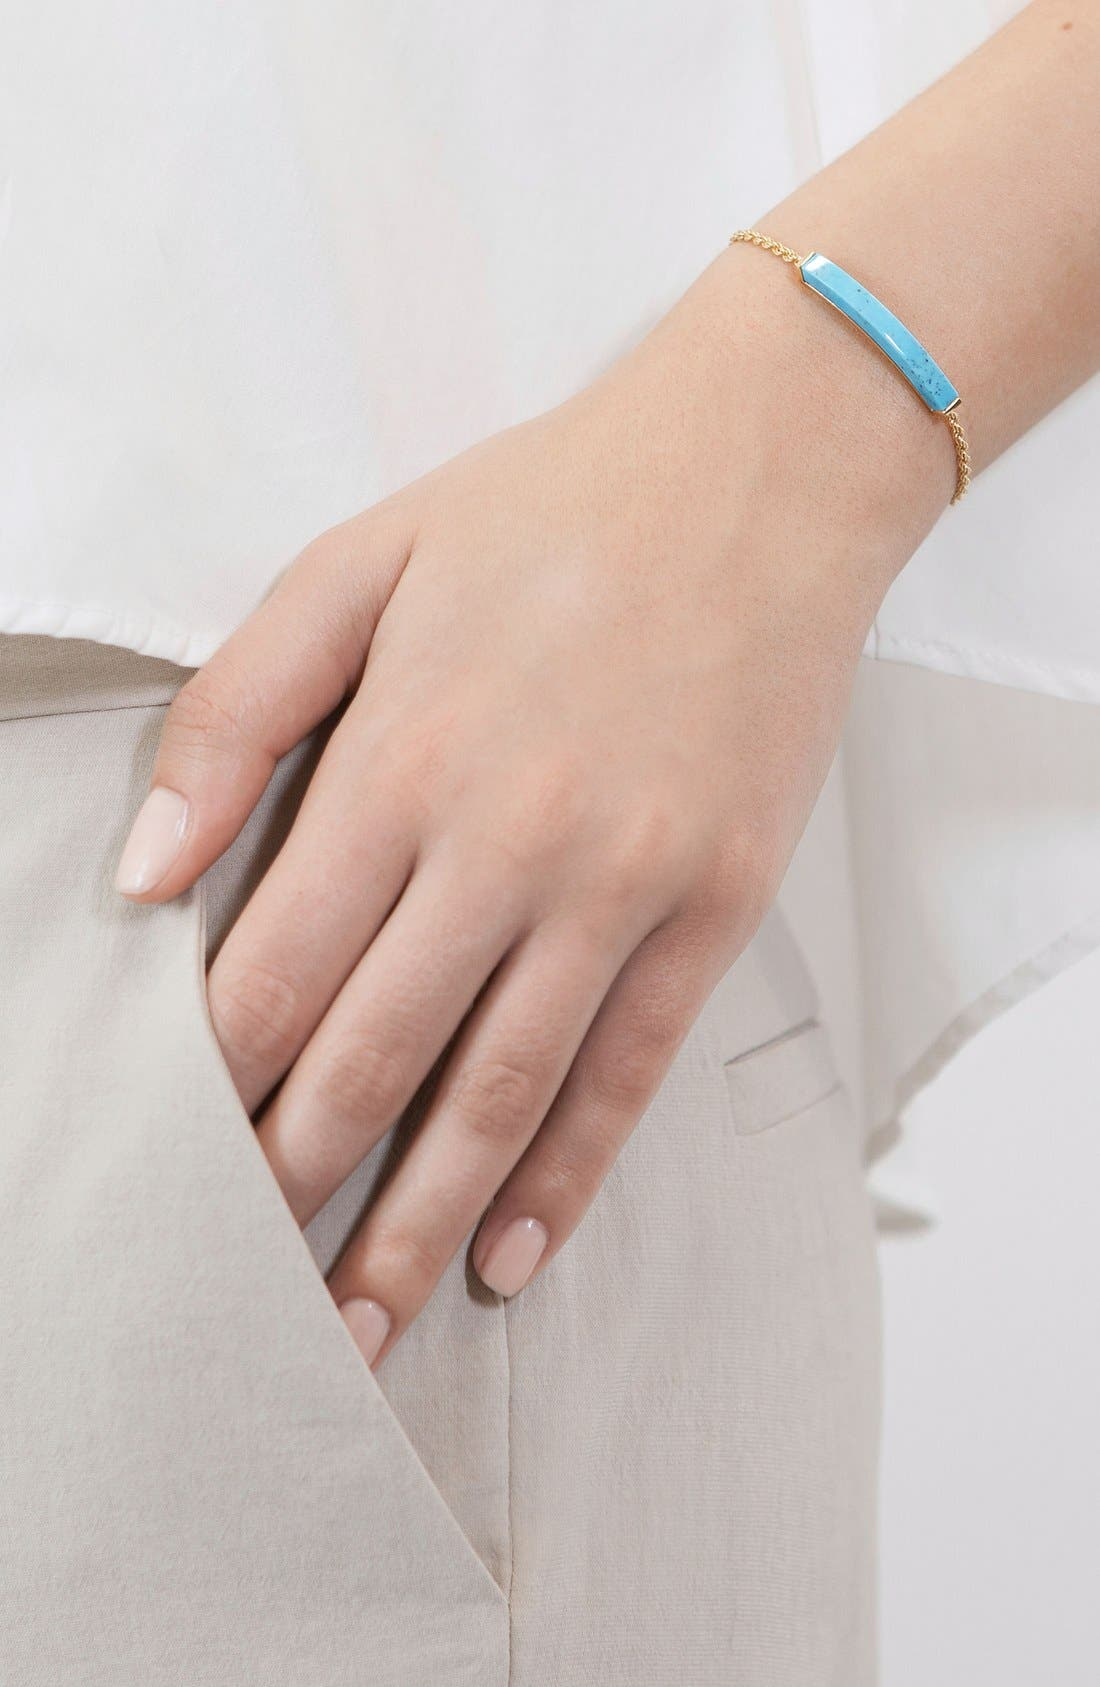 Linear Semiprecious Stone Bracelet,                             Alternate thumbnail 3, color,                             Gold/ Turquoise